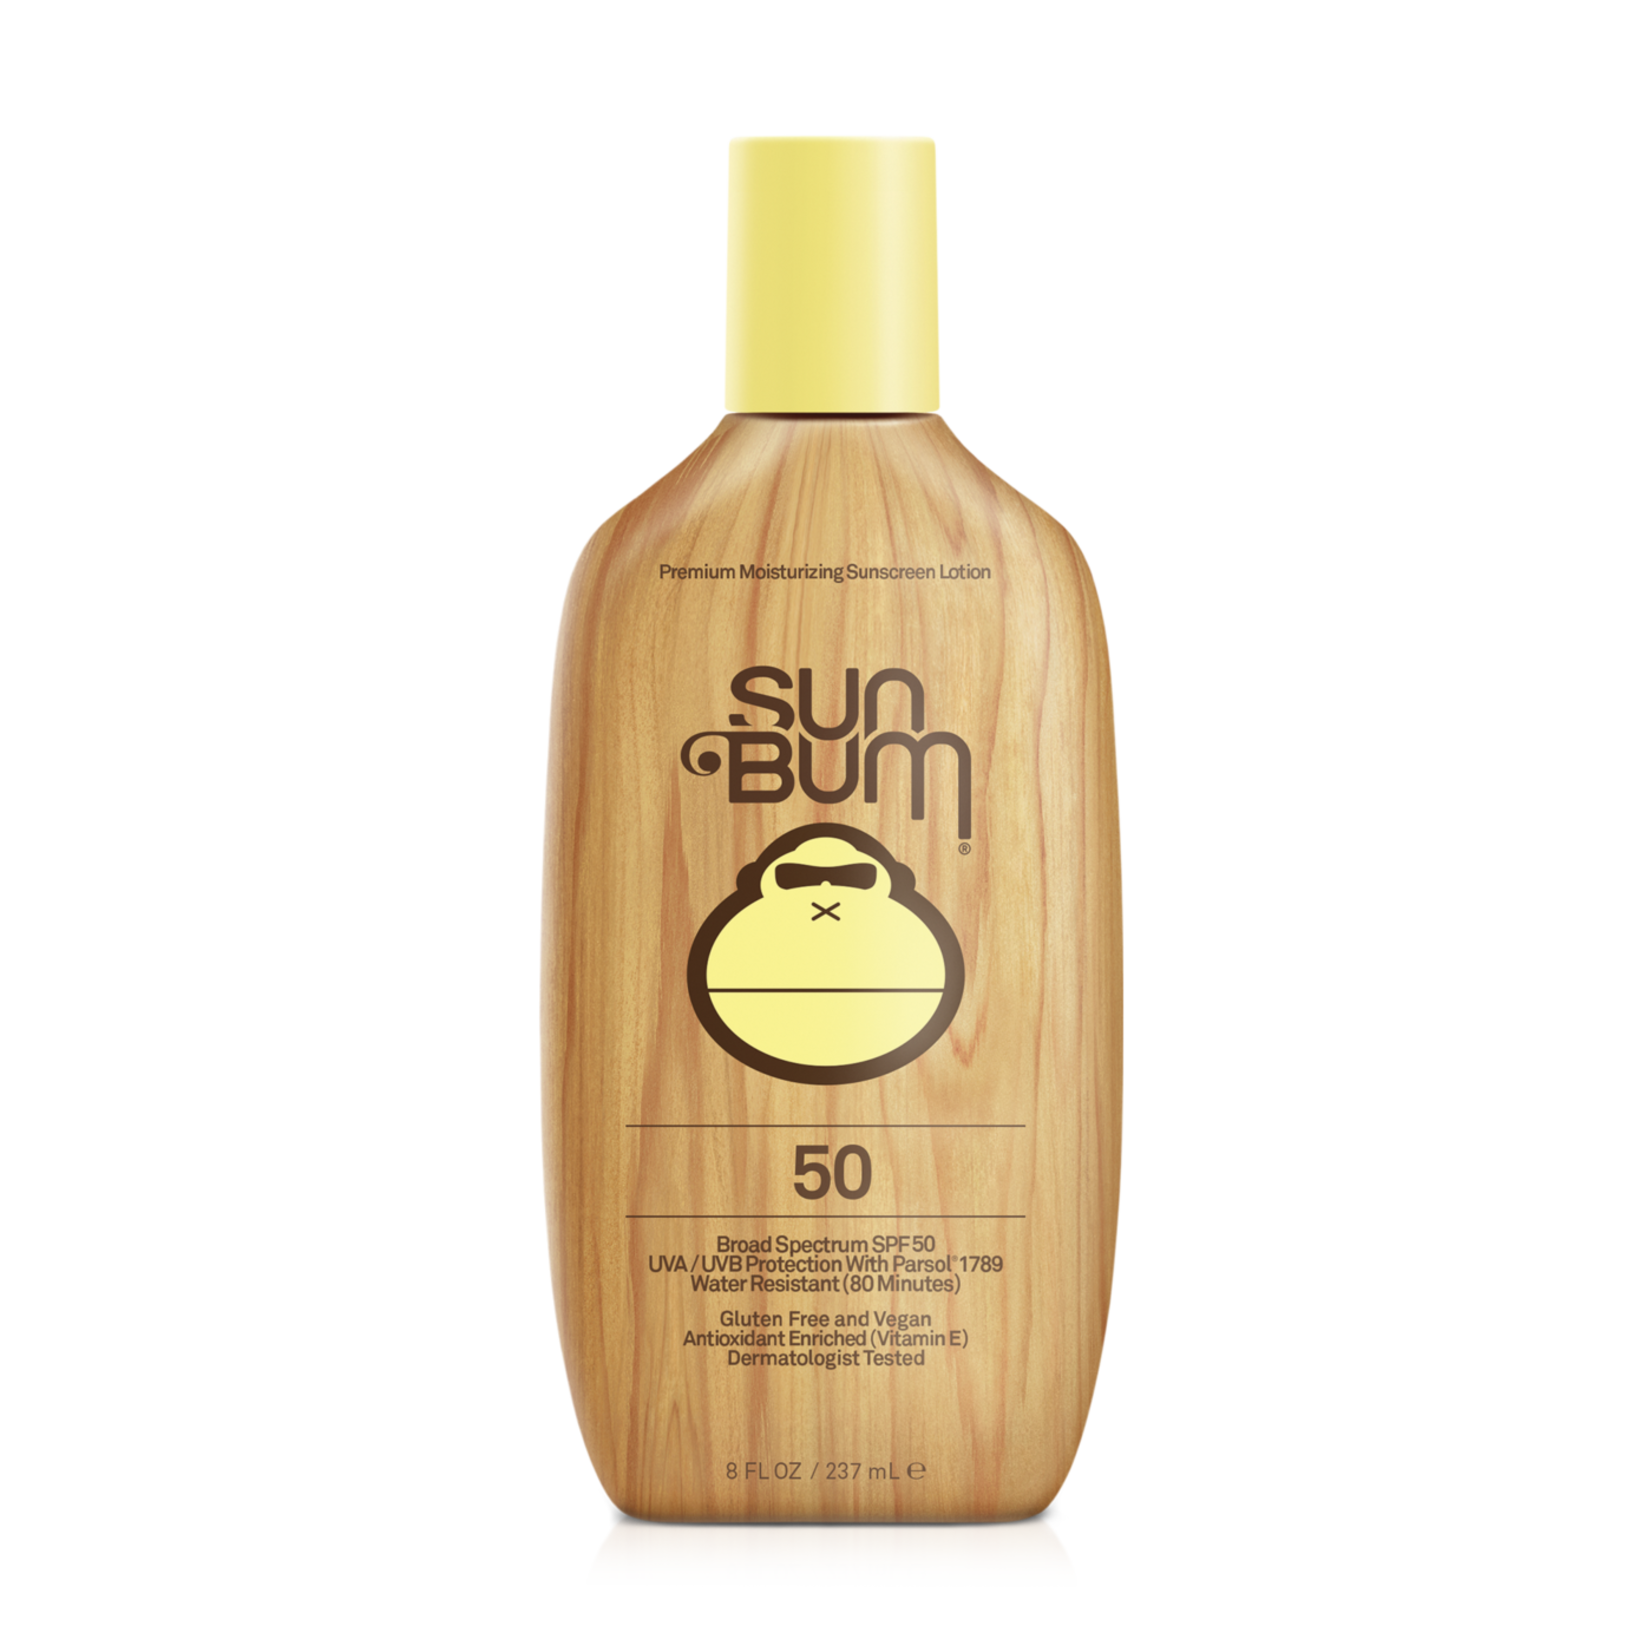 Sun Bum Sun Bum Lotion